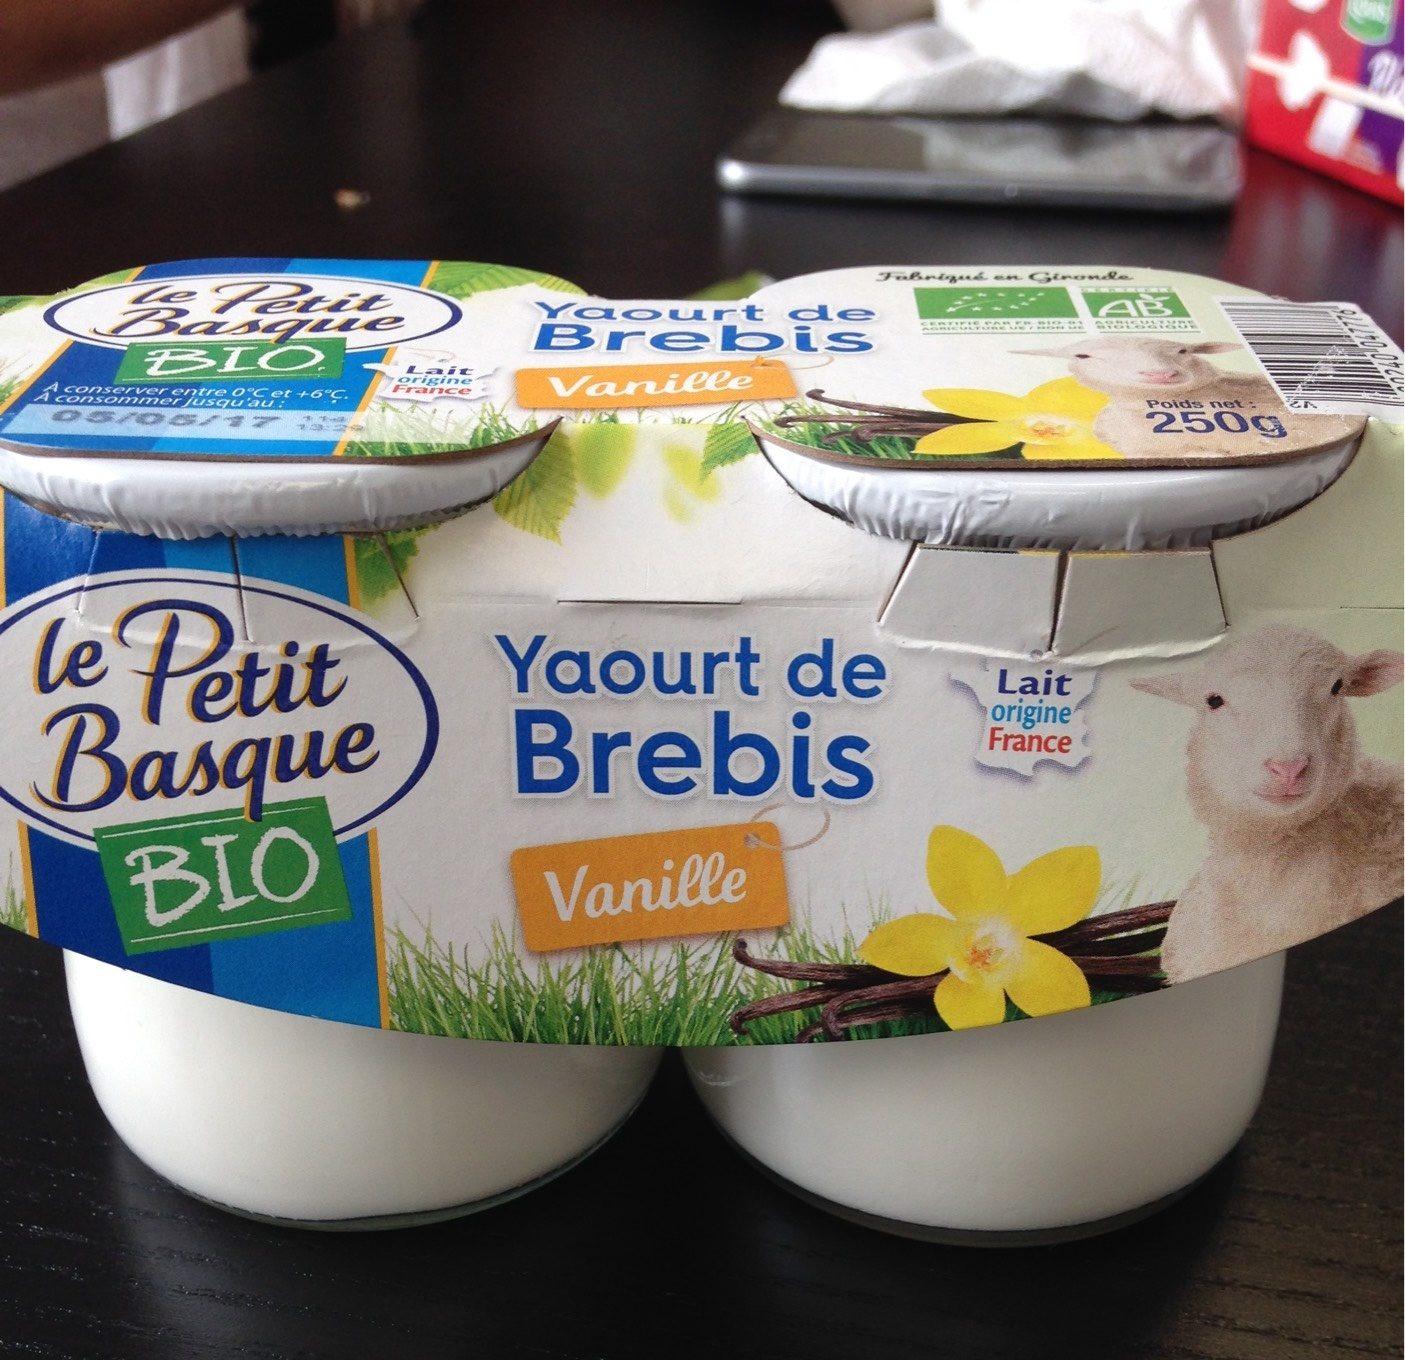 Yaourt de Brebis Vanille - Product - fr